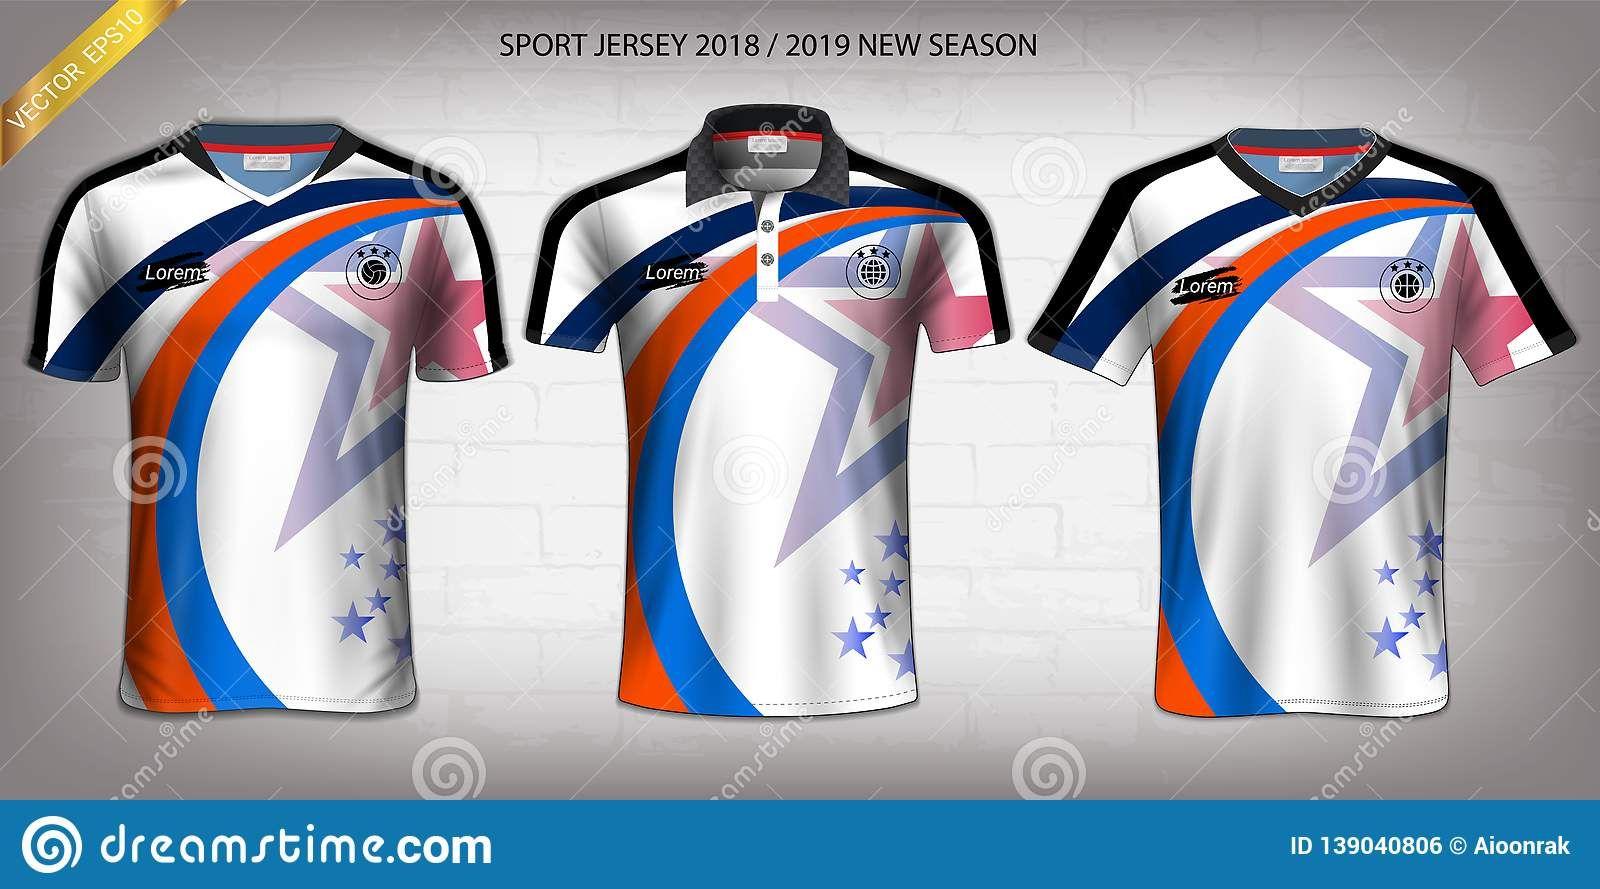 Download Pin By Bheempriyan On Hd Photos Sports Jersey Design Soccer Jersey Jersey Design